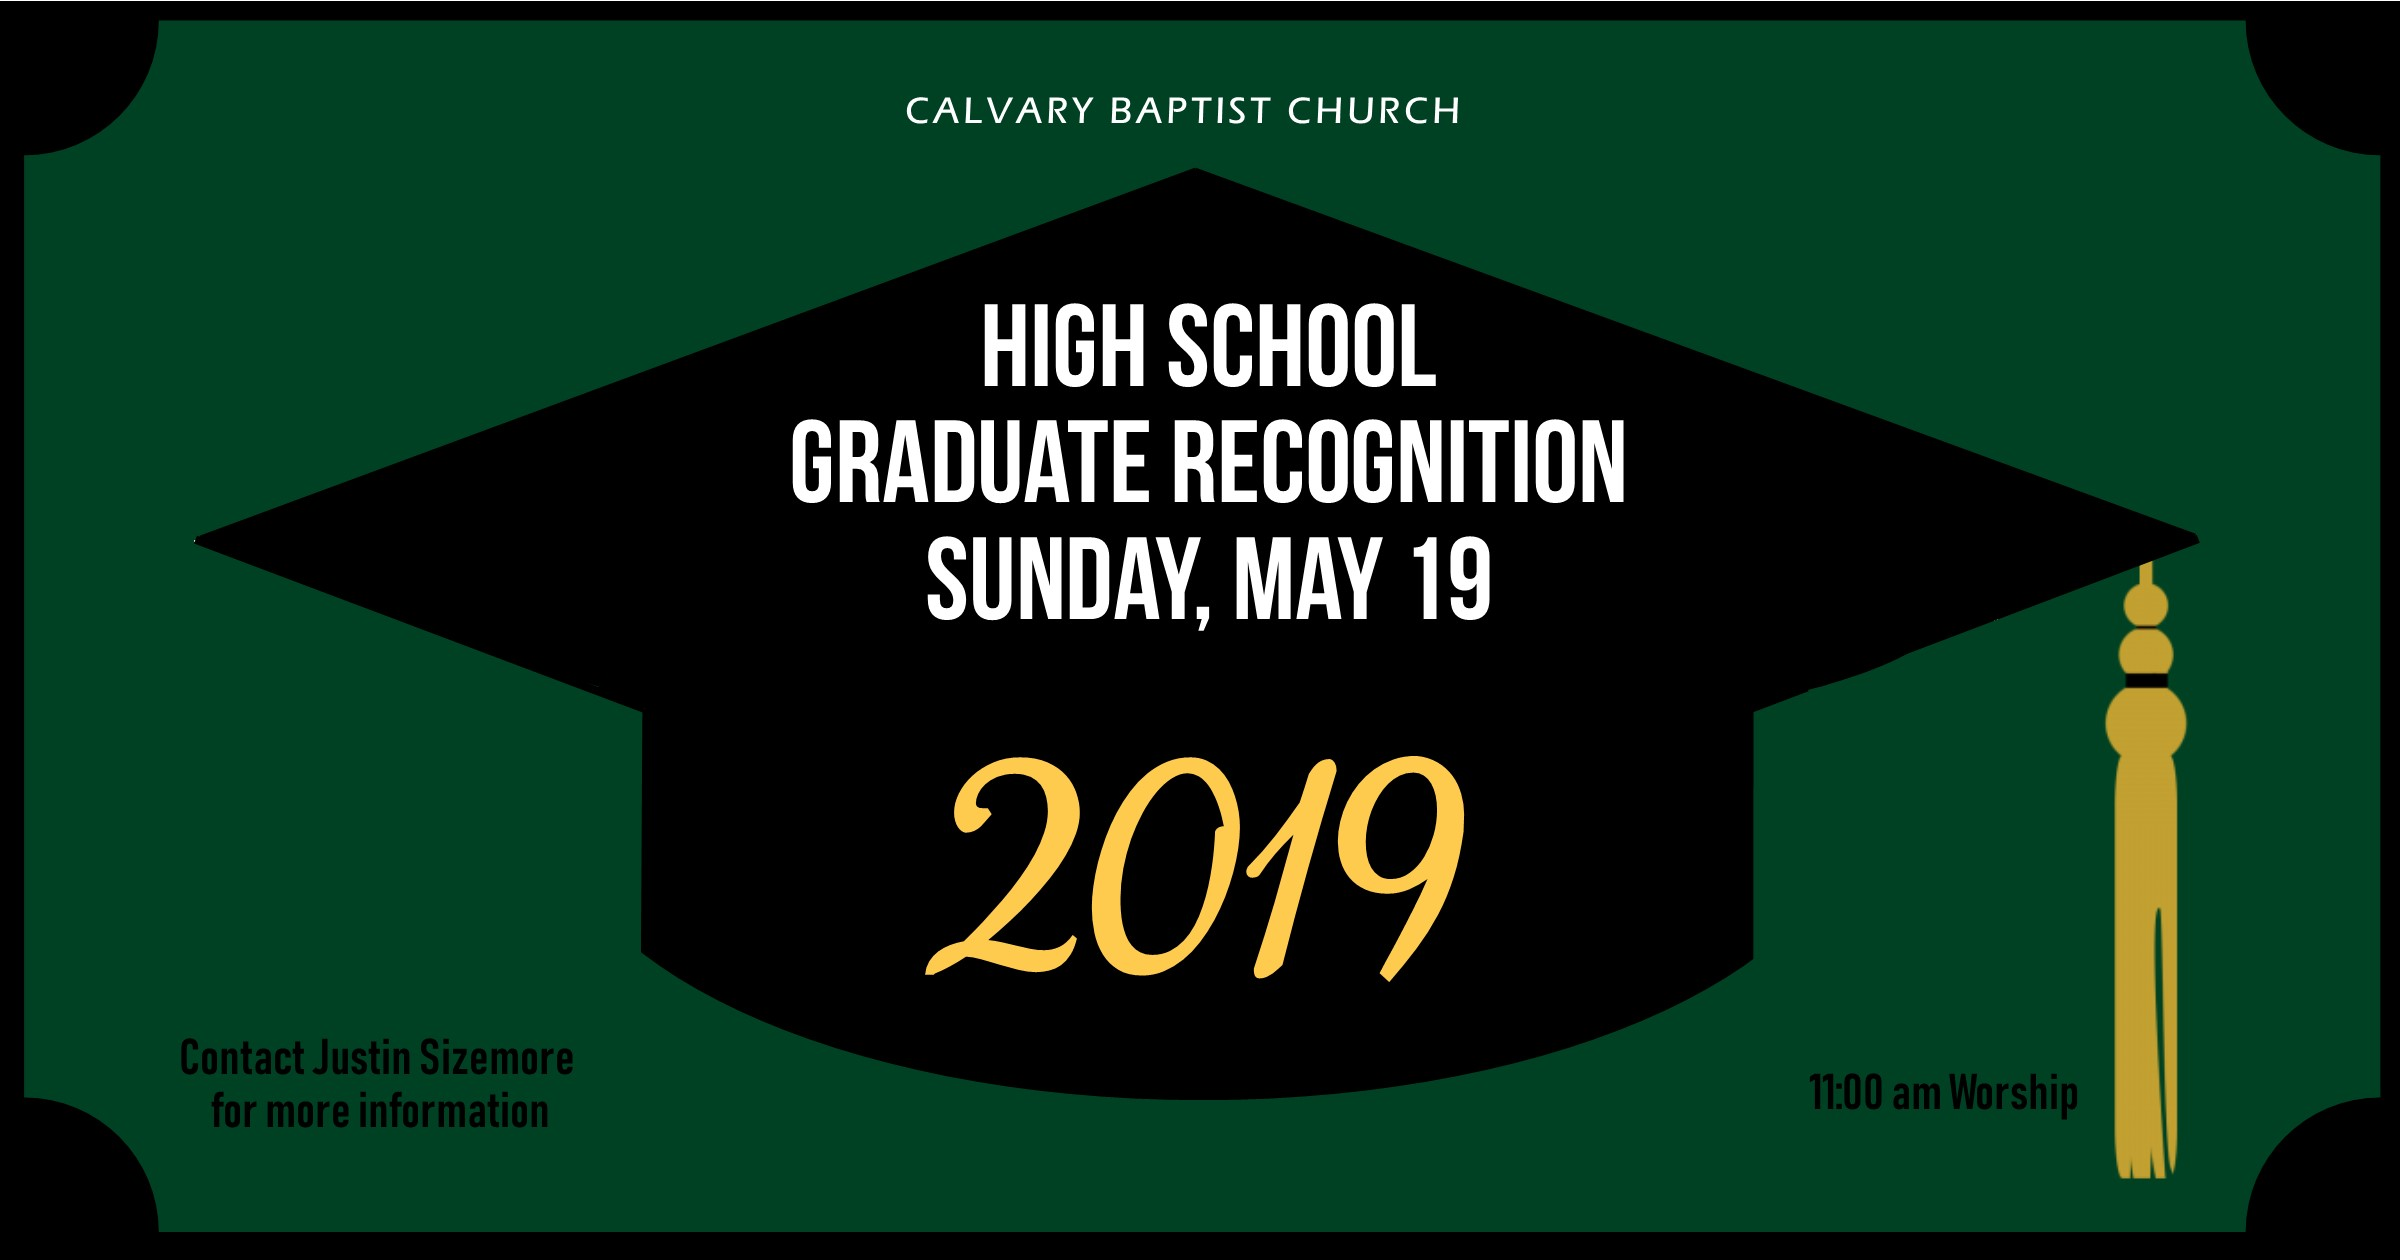 HS graduation fb image 2019.jpg